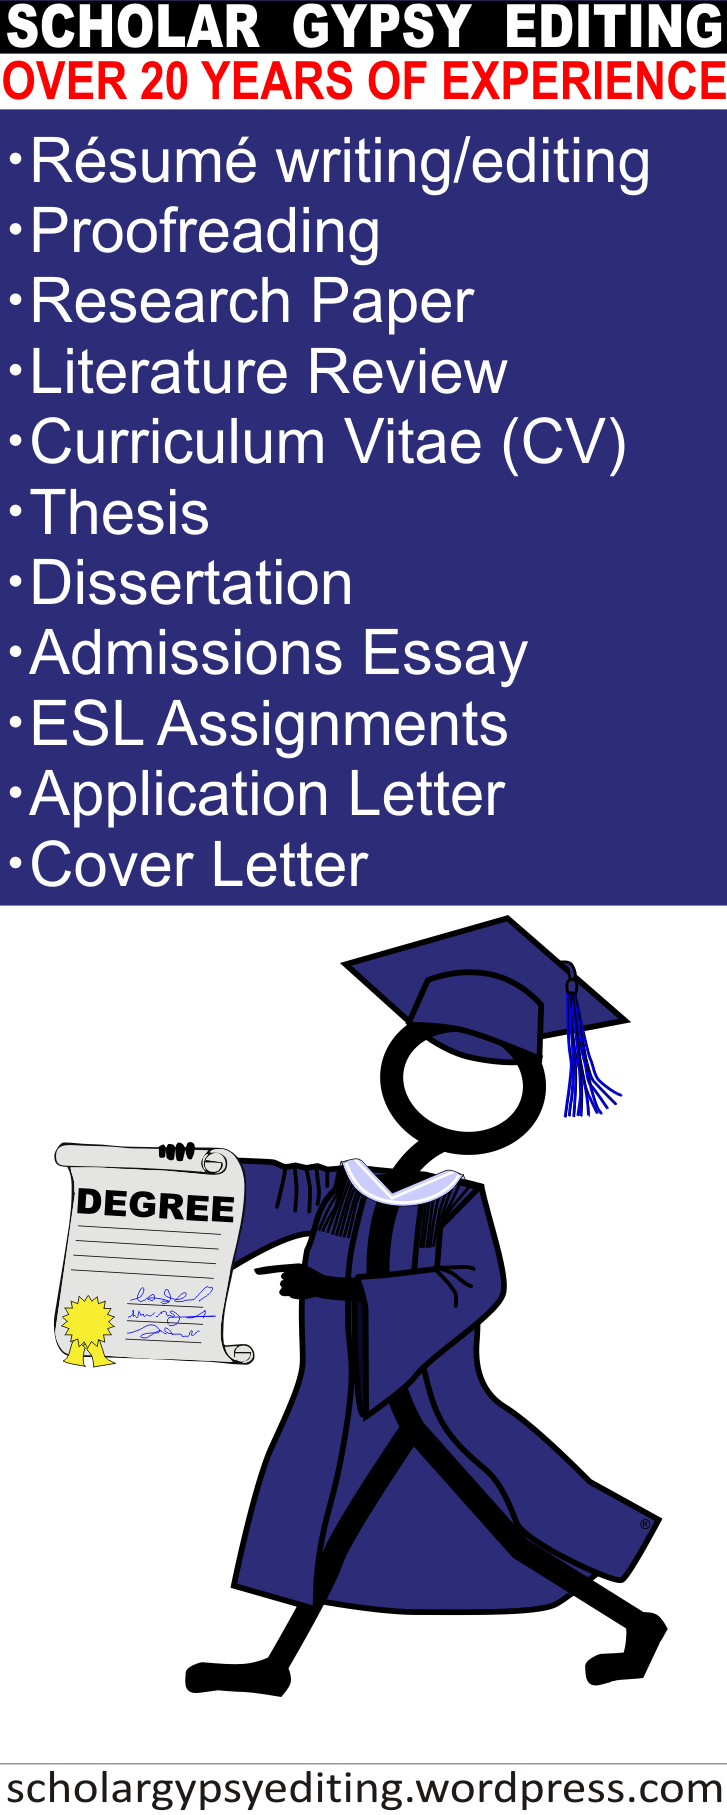 Proofreading Editing Resume Cv Curriculumvitae Apaformatting